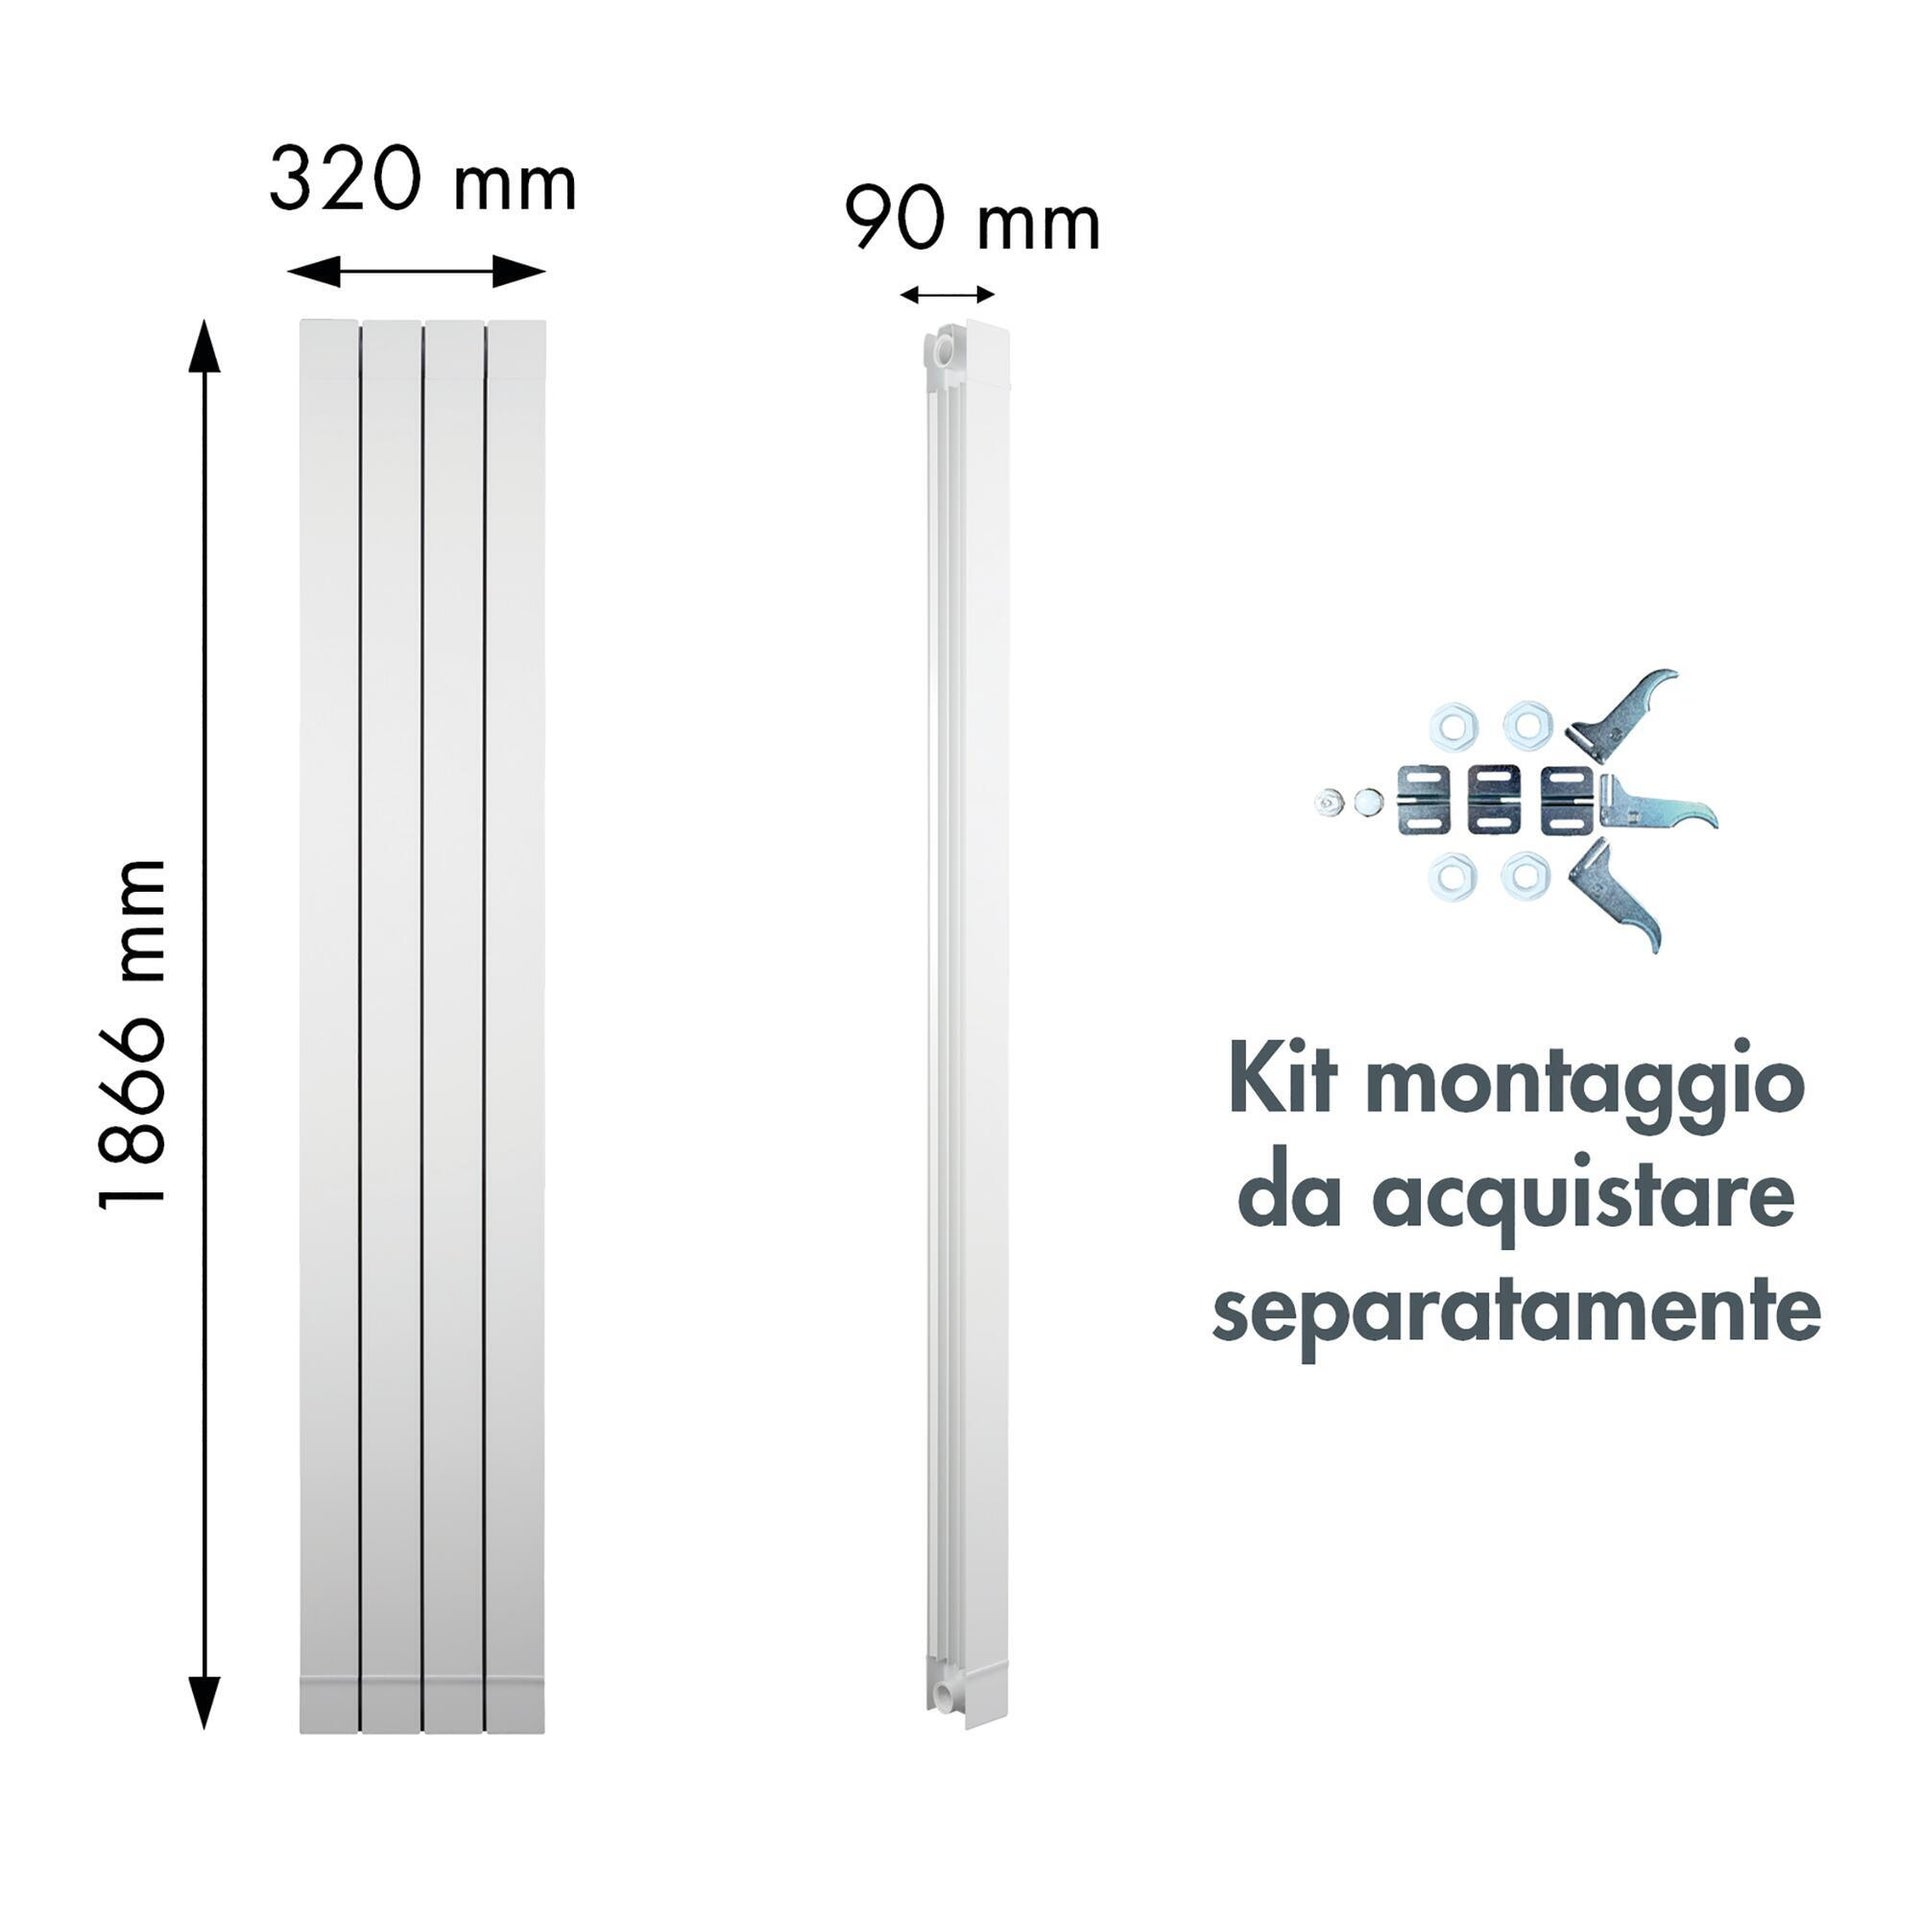 Radiatore acqua calda PRODIGE Superior in alluminio 4 elementi interasse 180 cm - 5